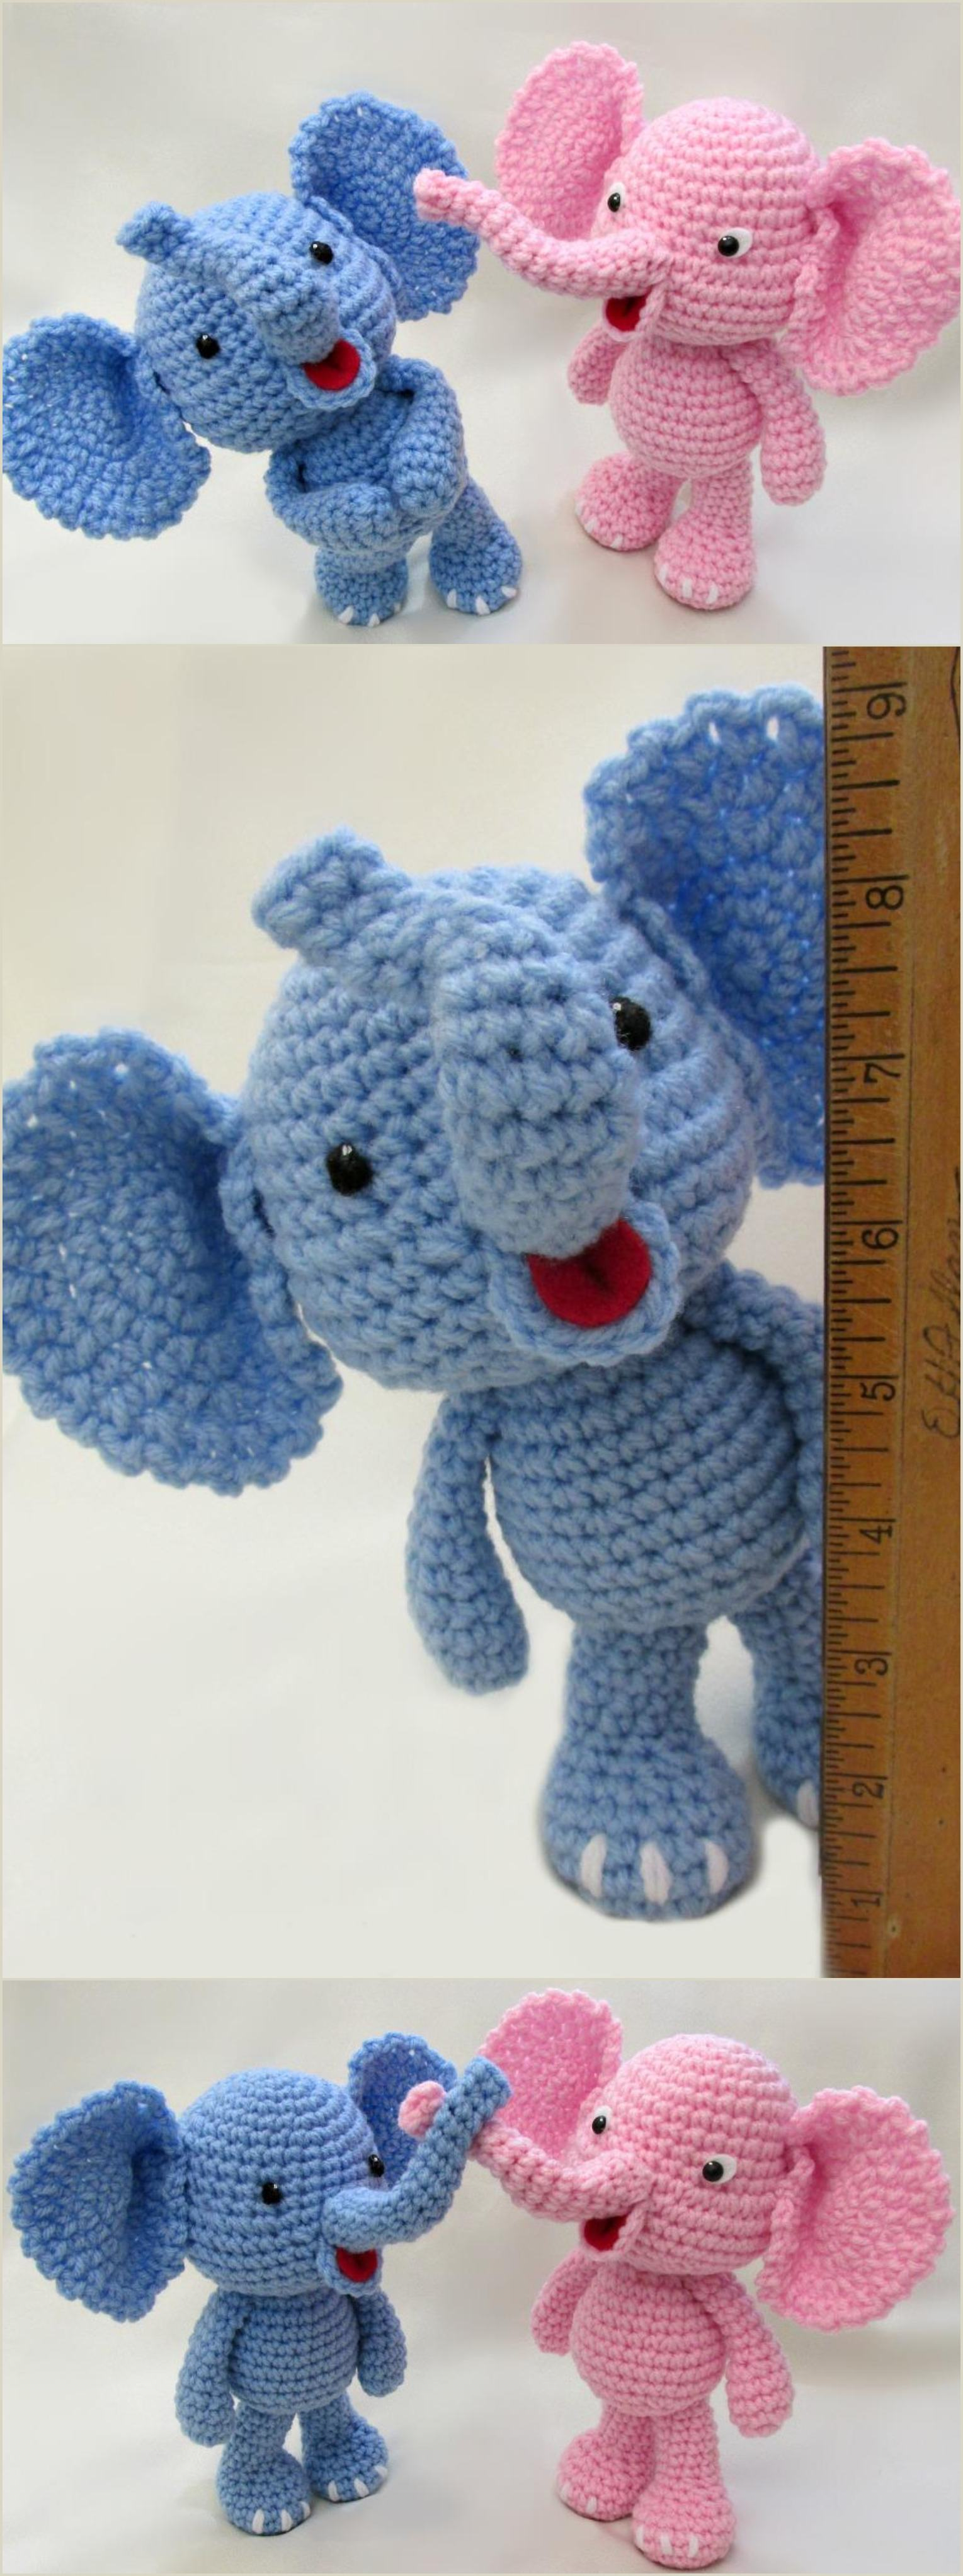 Amigurumi Elephant Free Crochet Pattern | 4088x1529